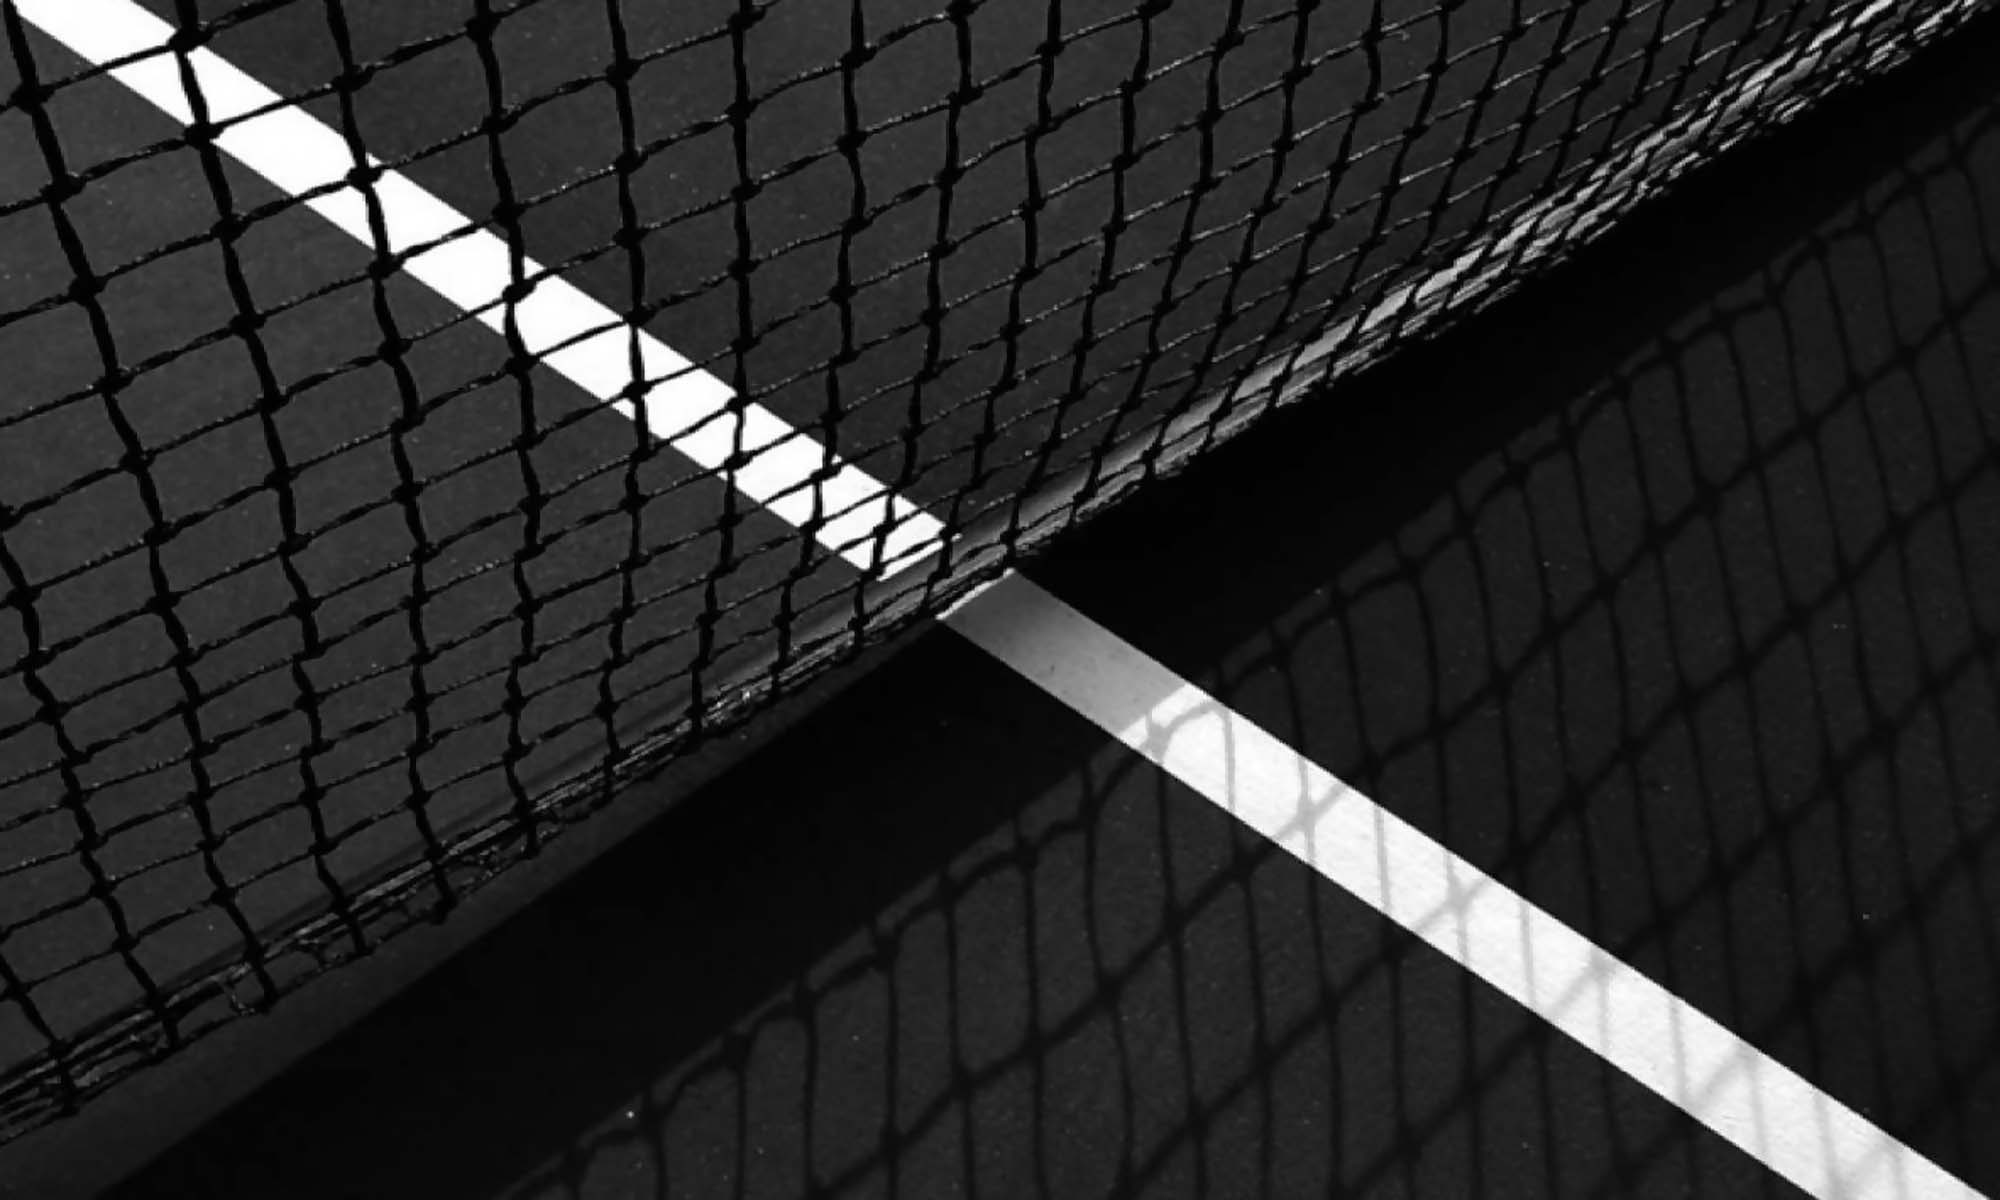 Internetpräsenz des Tischtennisvereins aus Zaisenhausen